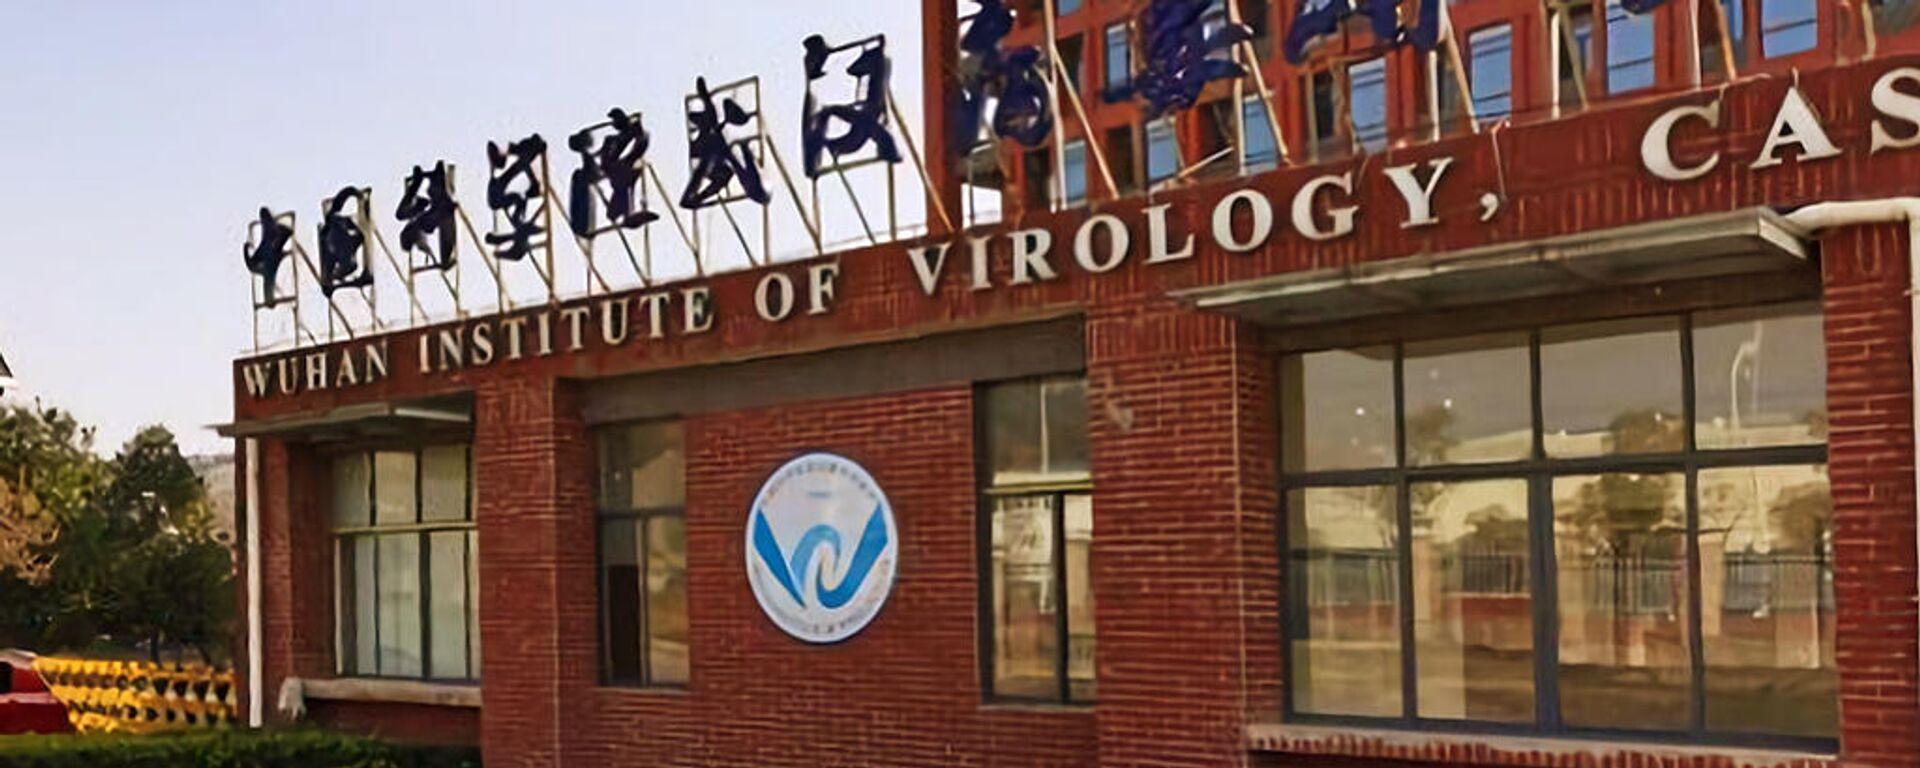 Institut für Virologie Wuhan - SNA, 1920, 27.05.2021